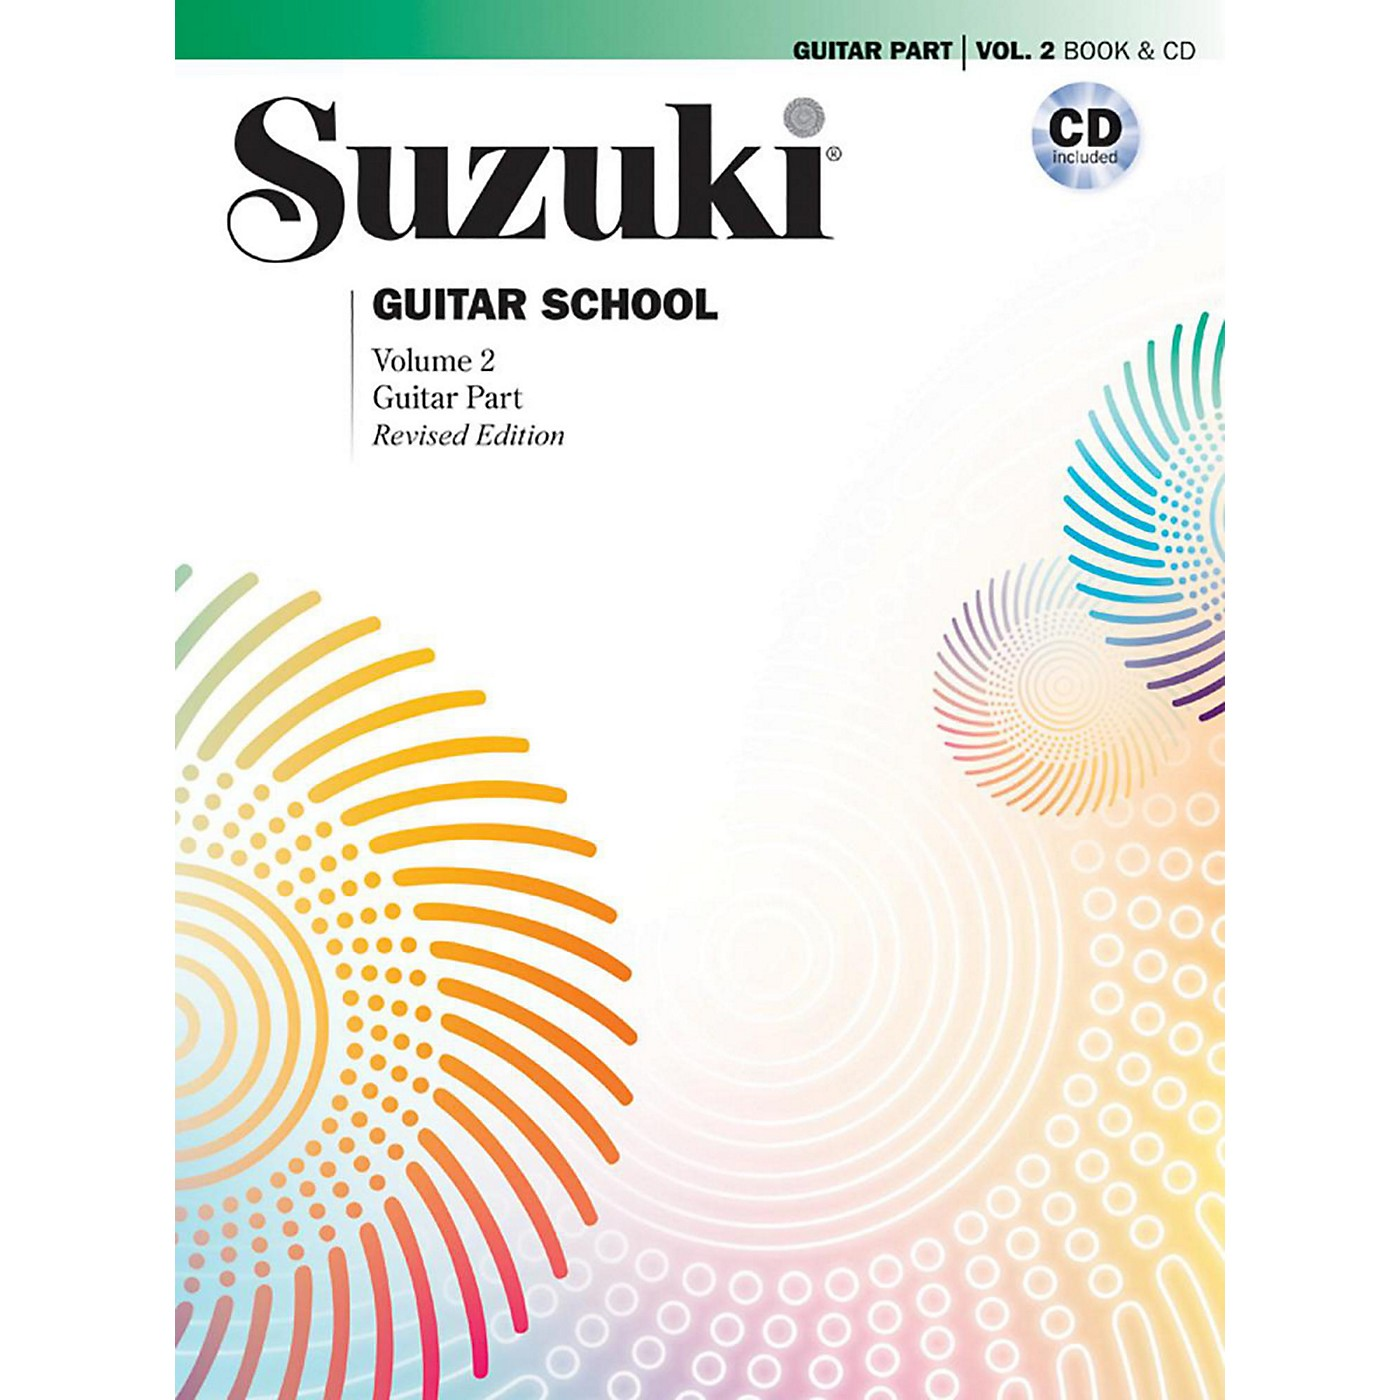 Suzuki Suzuki Guitar School Guitar Part & CD, Volume 2 Book & CD Revised thumbnail